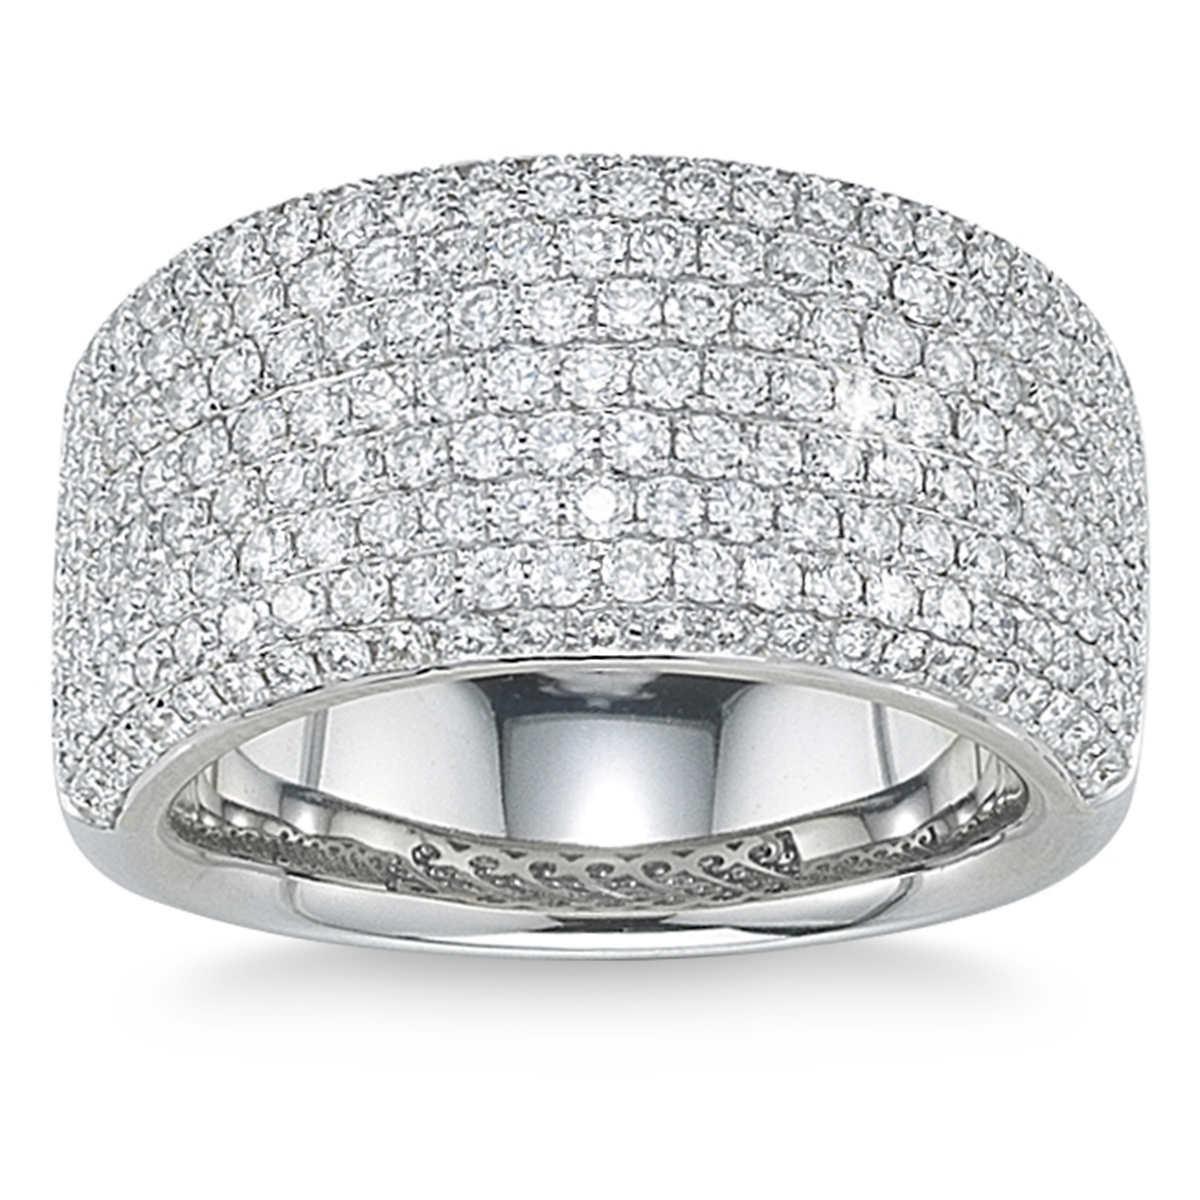 diamond bands pave diamond wedding band Round Brilliant 1 89 ctw VS2 Clarity I Color Diamond 18kt White Gold Pave Band